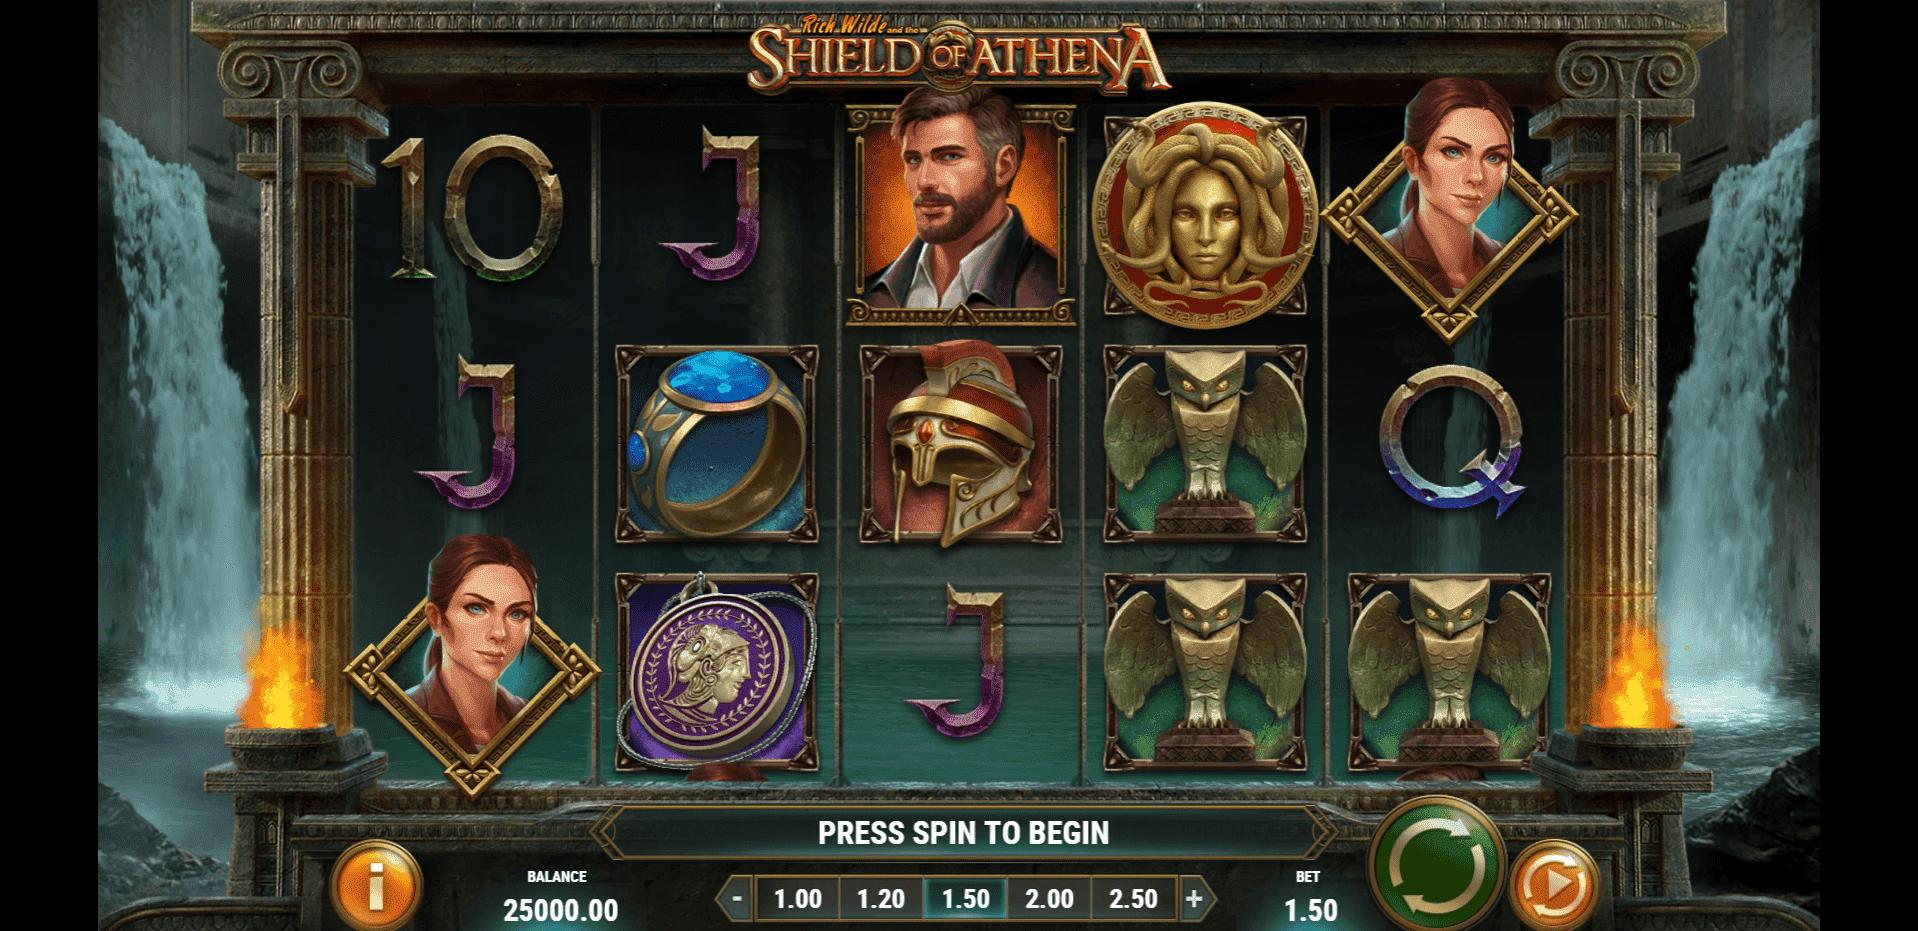 Rich Wilde and the Shield of Athena slot machine screenshot